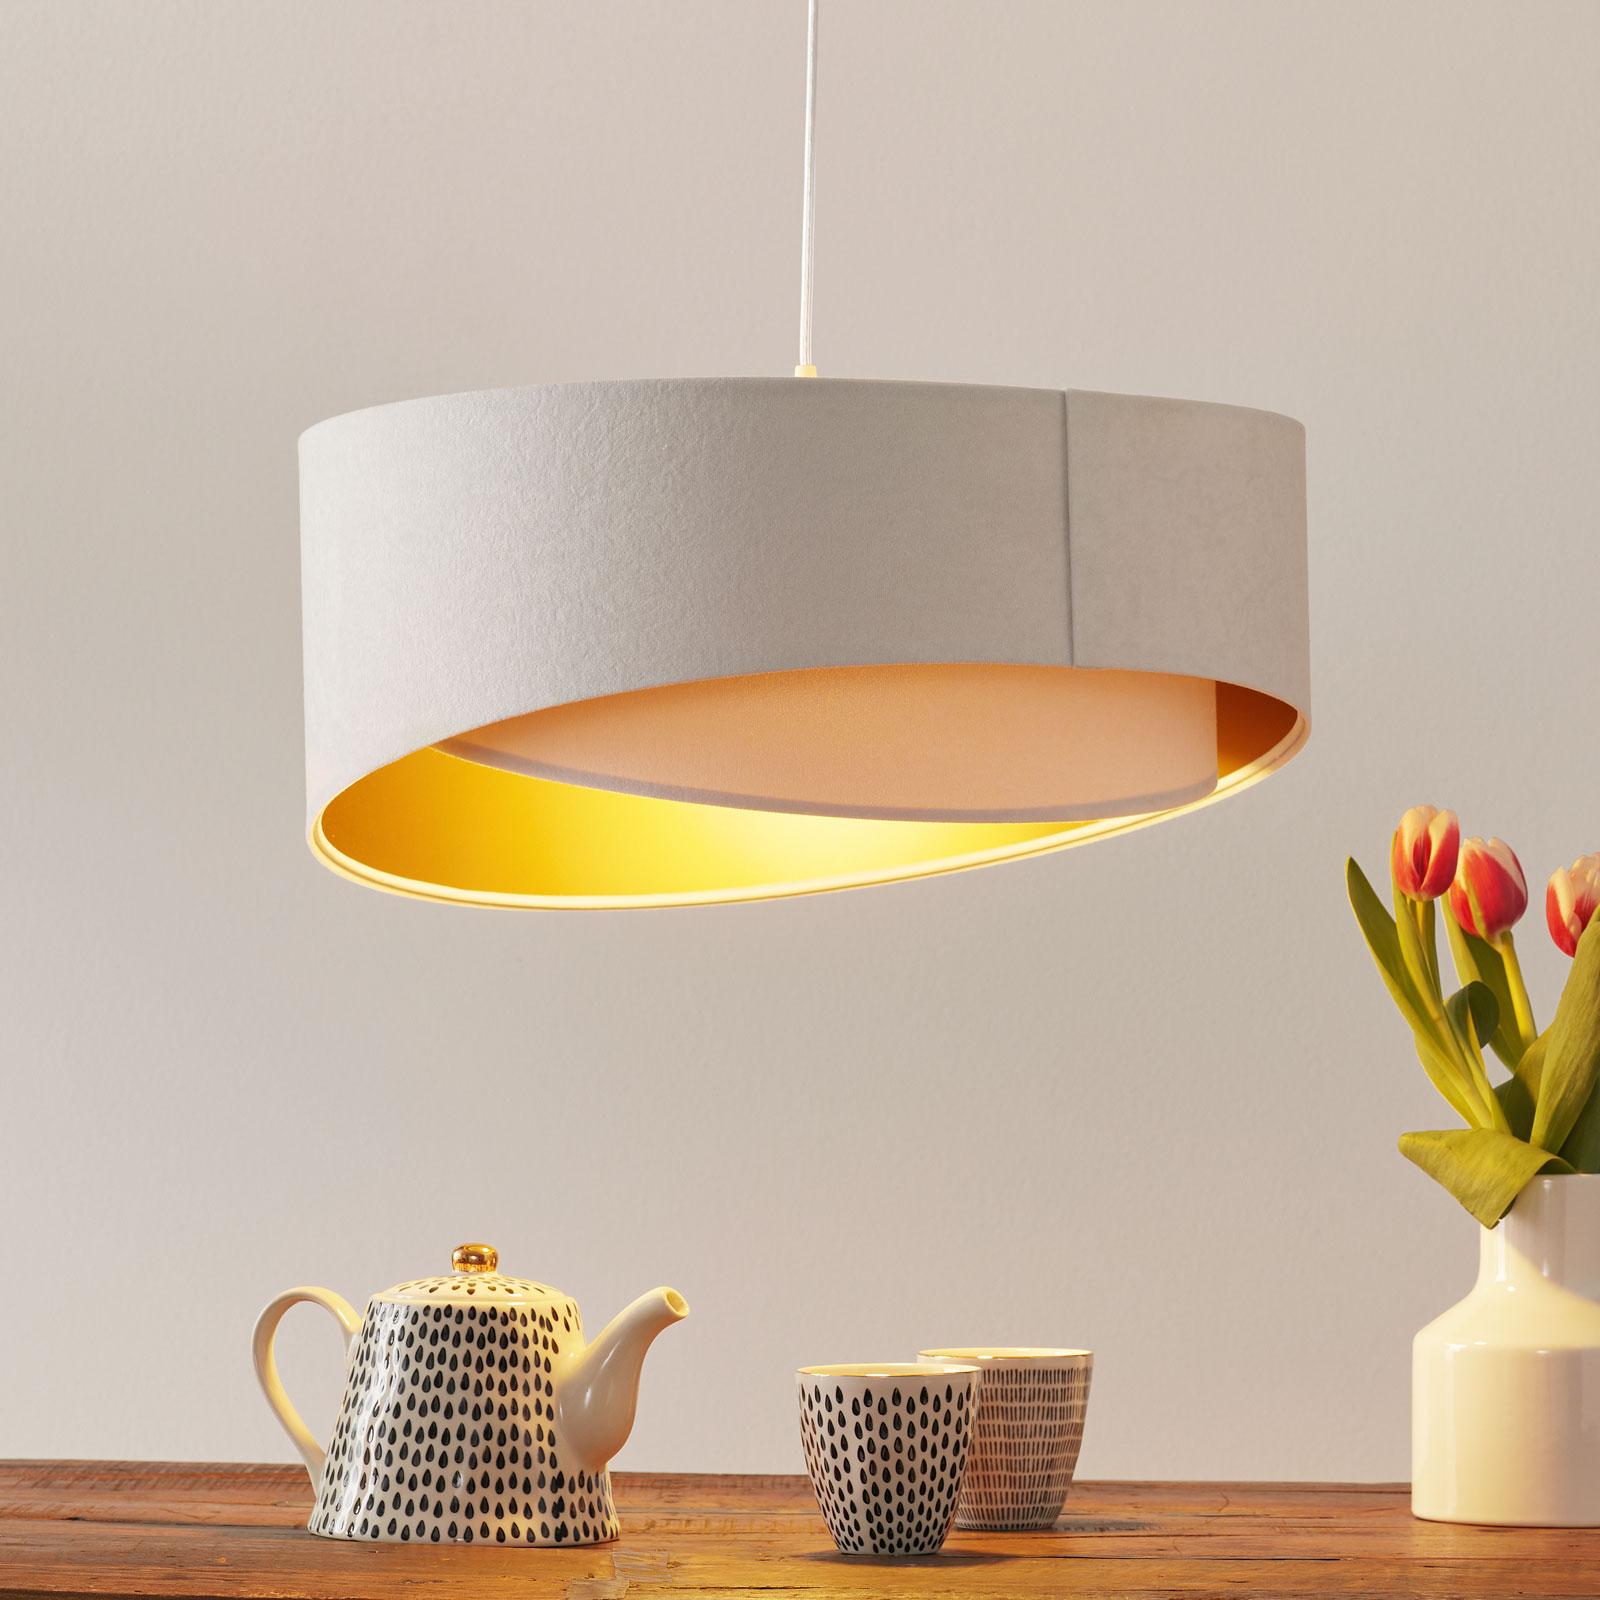 Dwukolorowa lampa wisząca Chloe, jak warstwowa